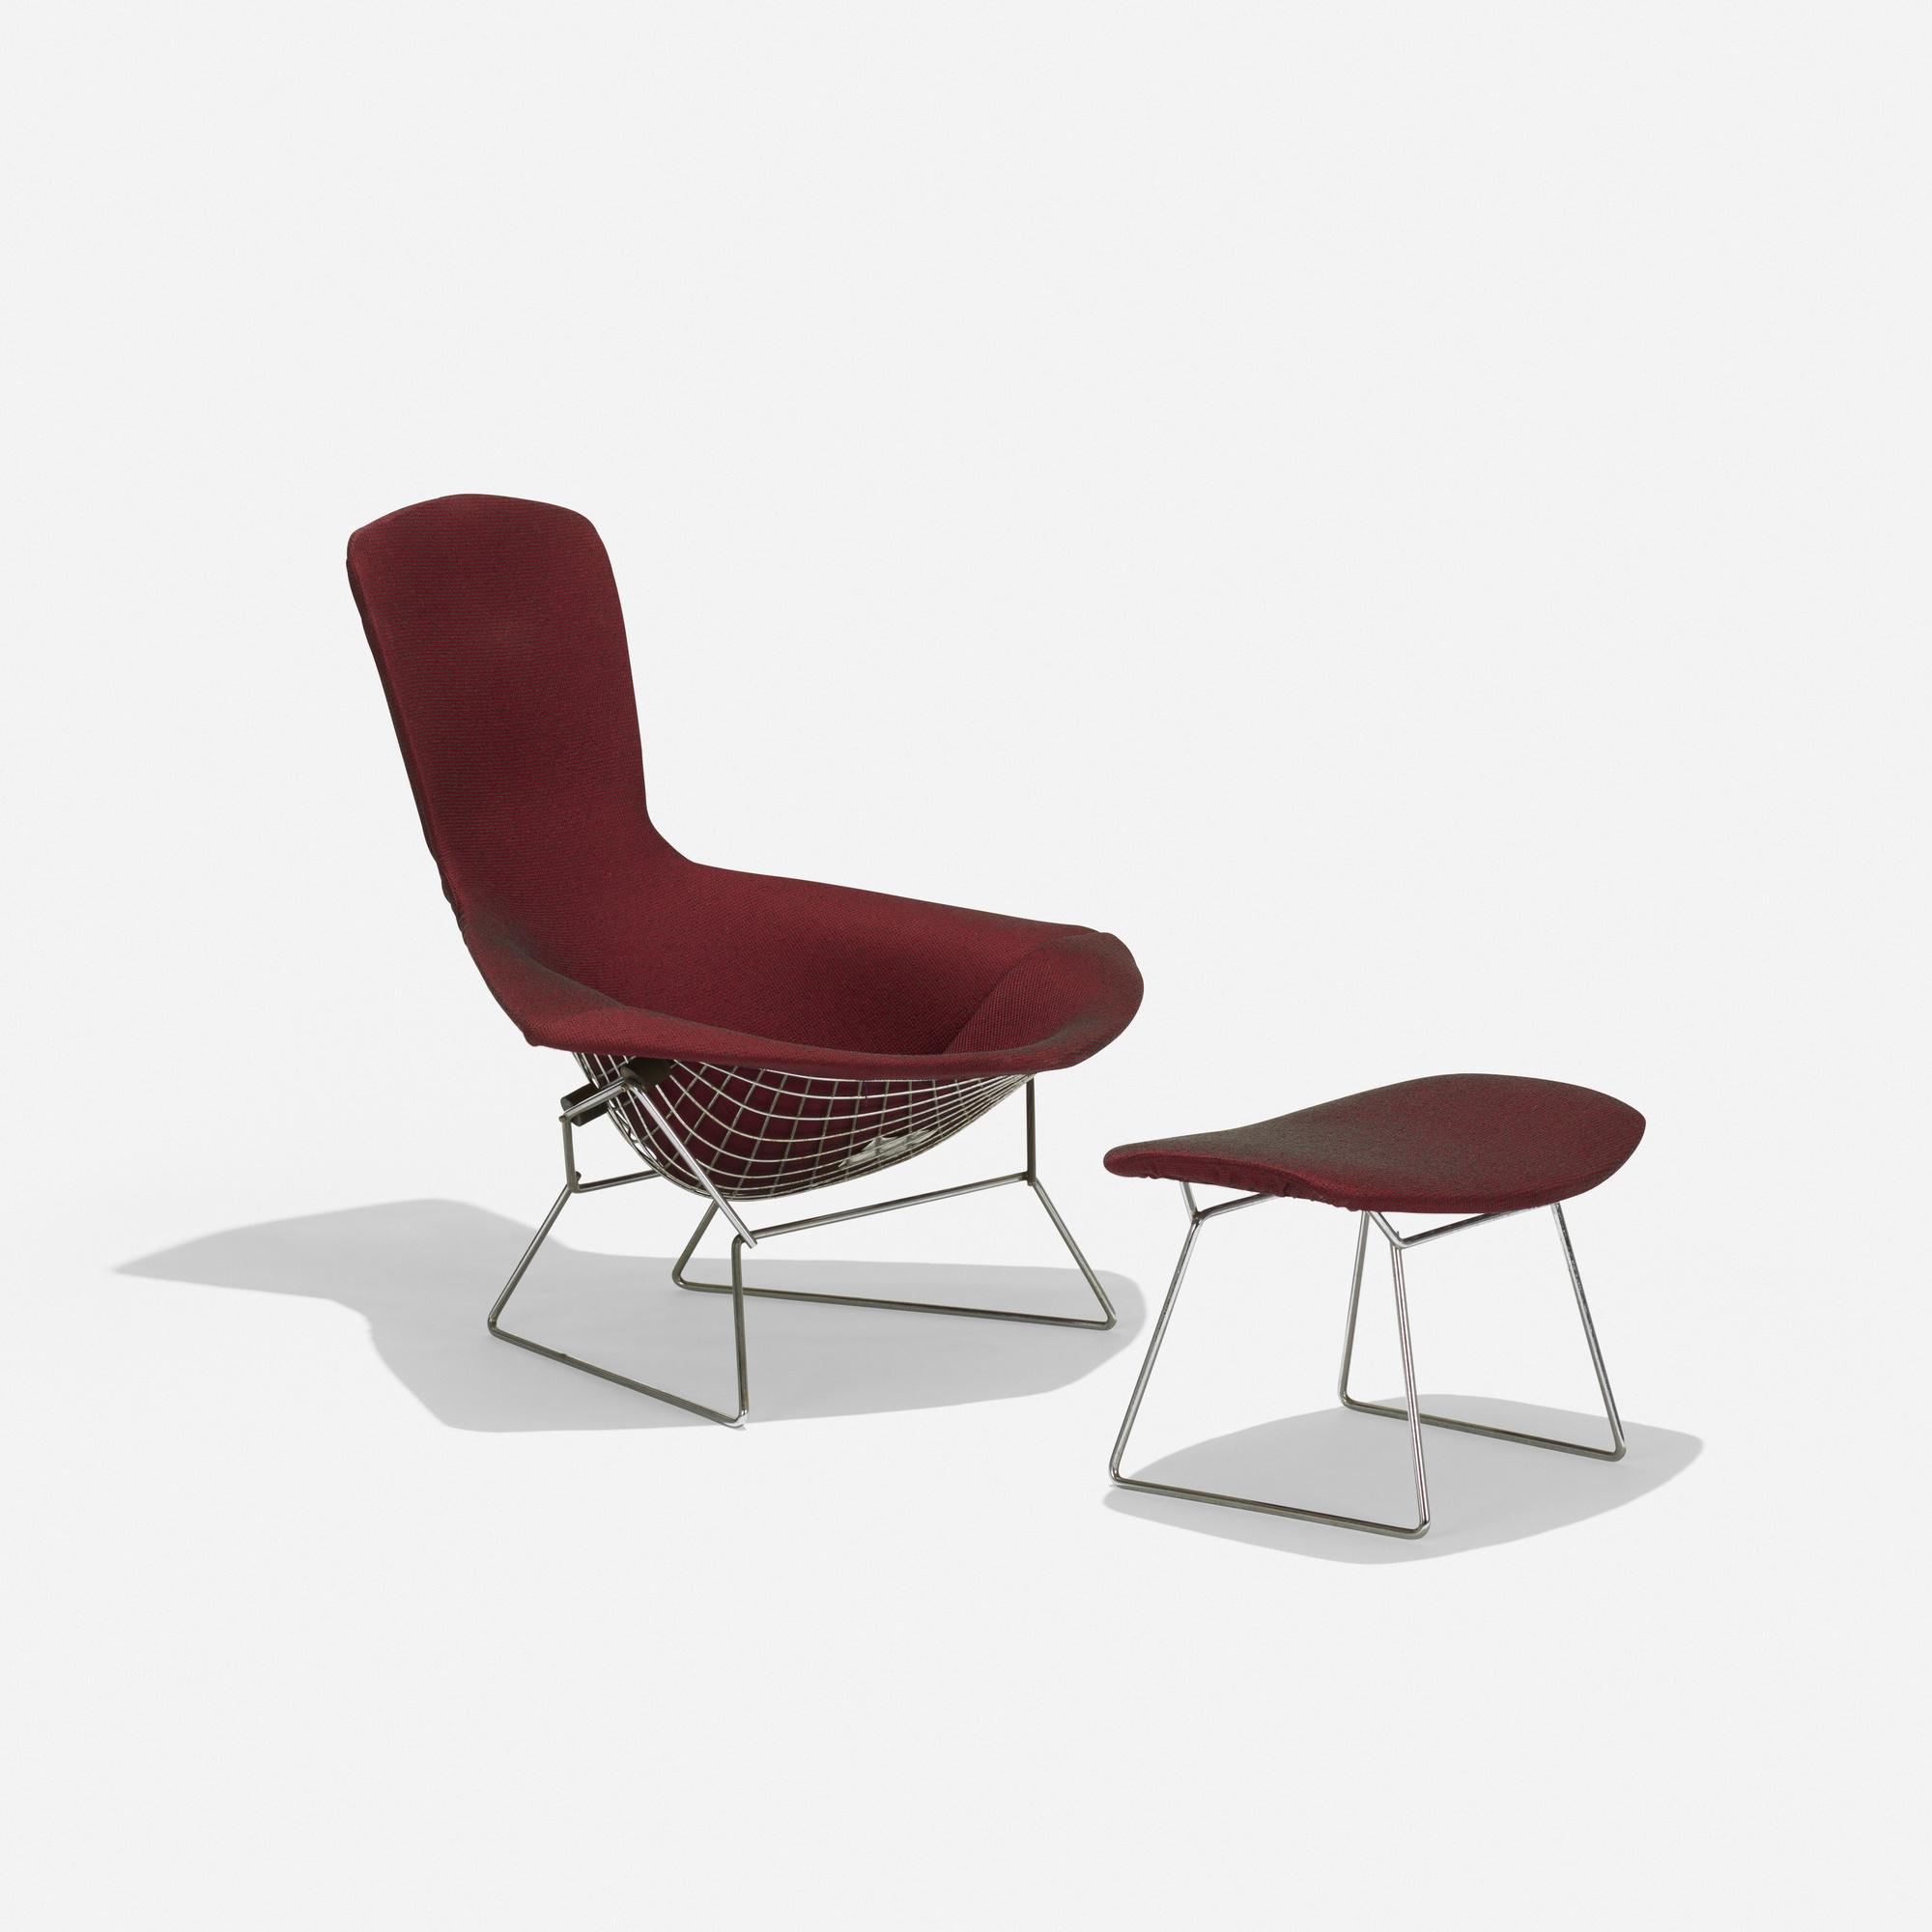 650 Harry Bertoia Bird Chair And Ottoman American Design 20